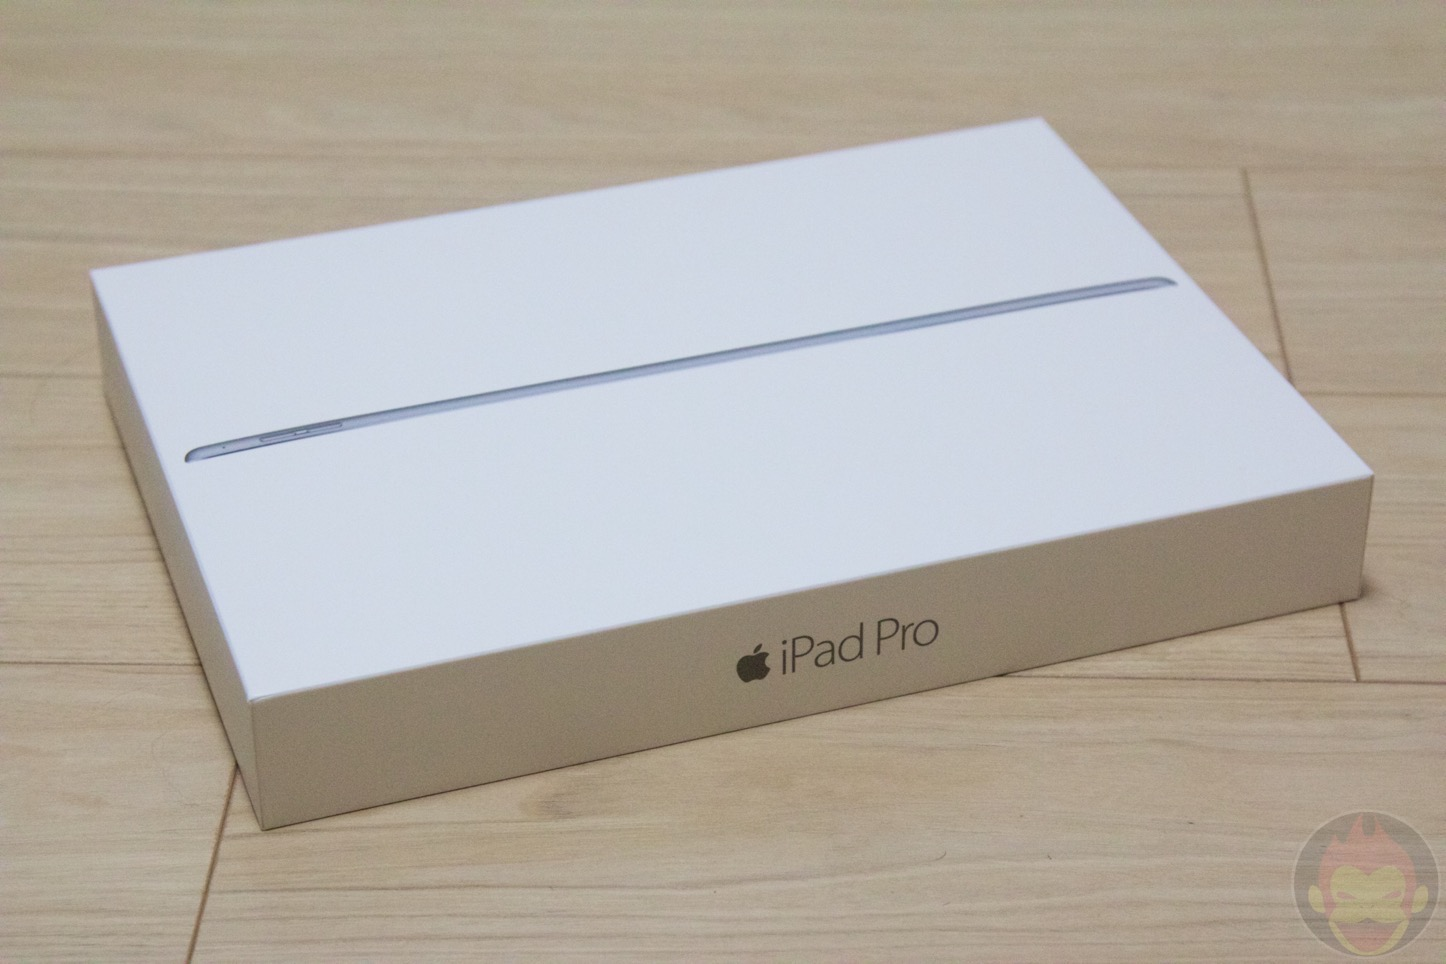 IPad Pro Unboxing